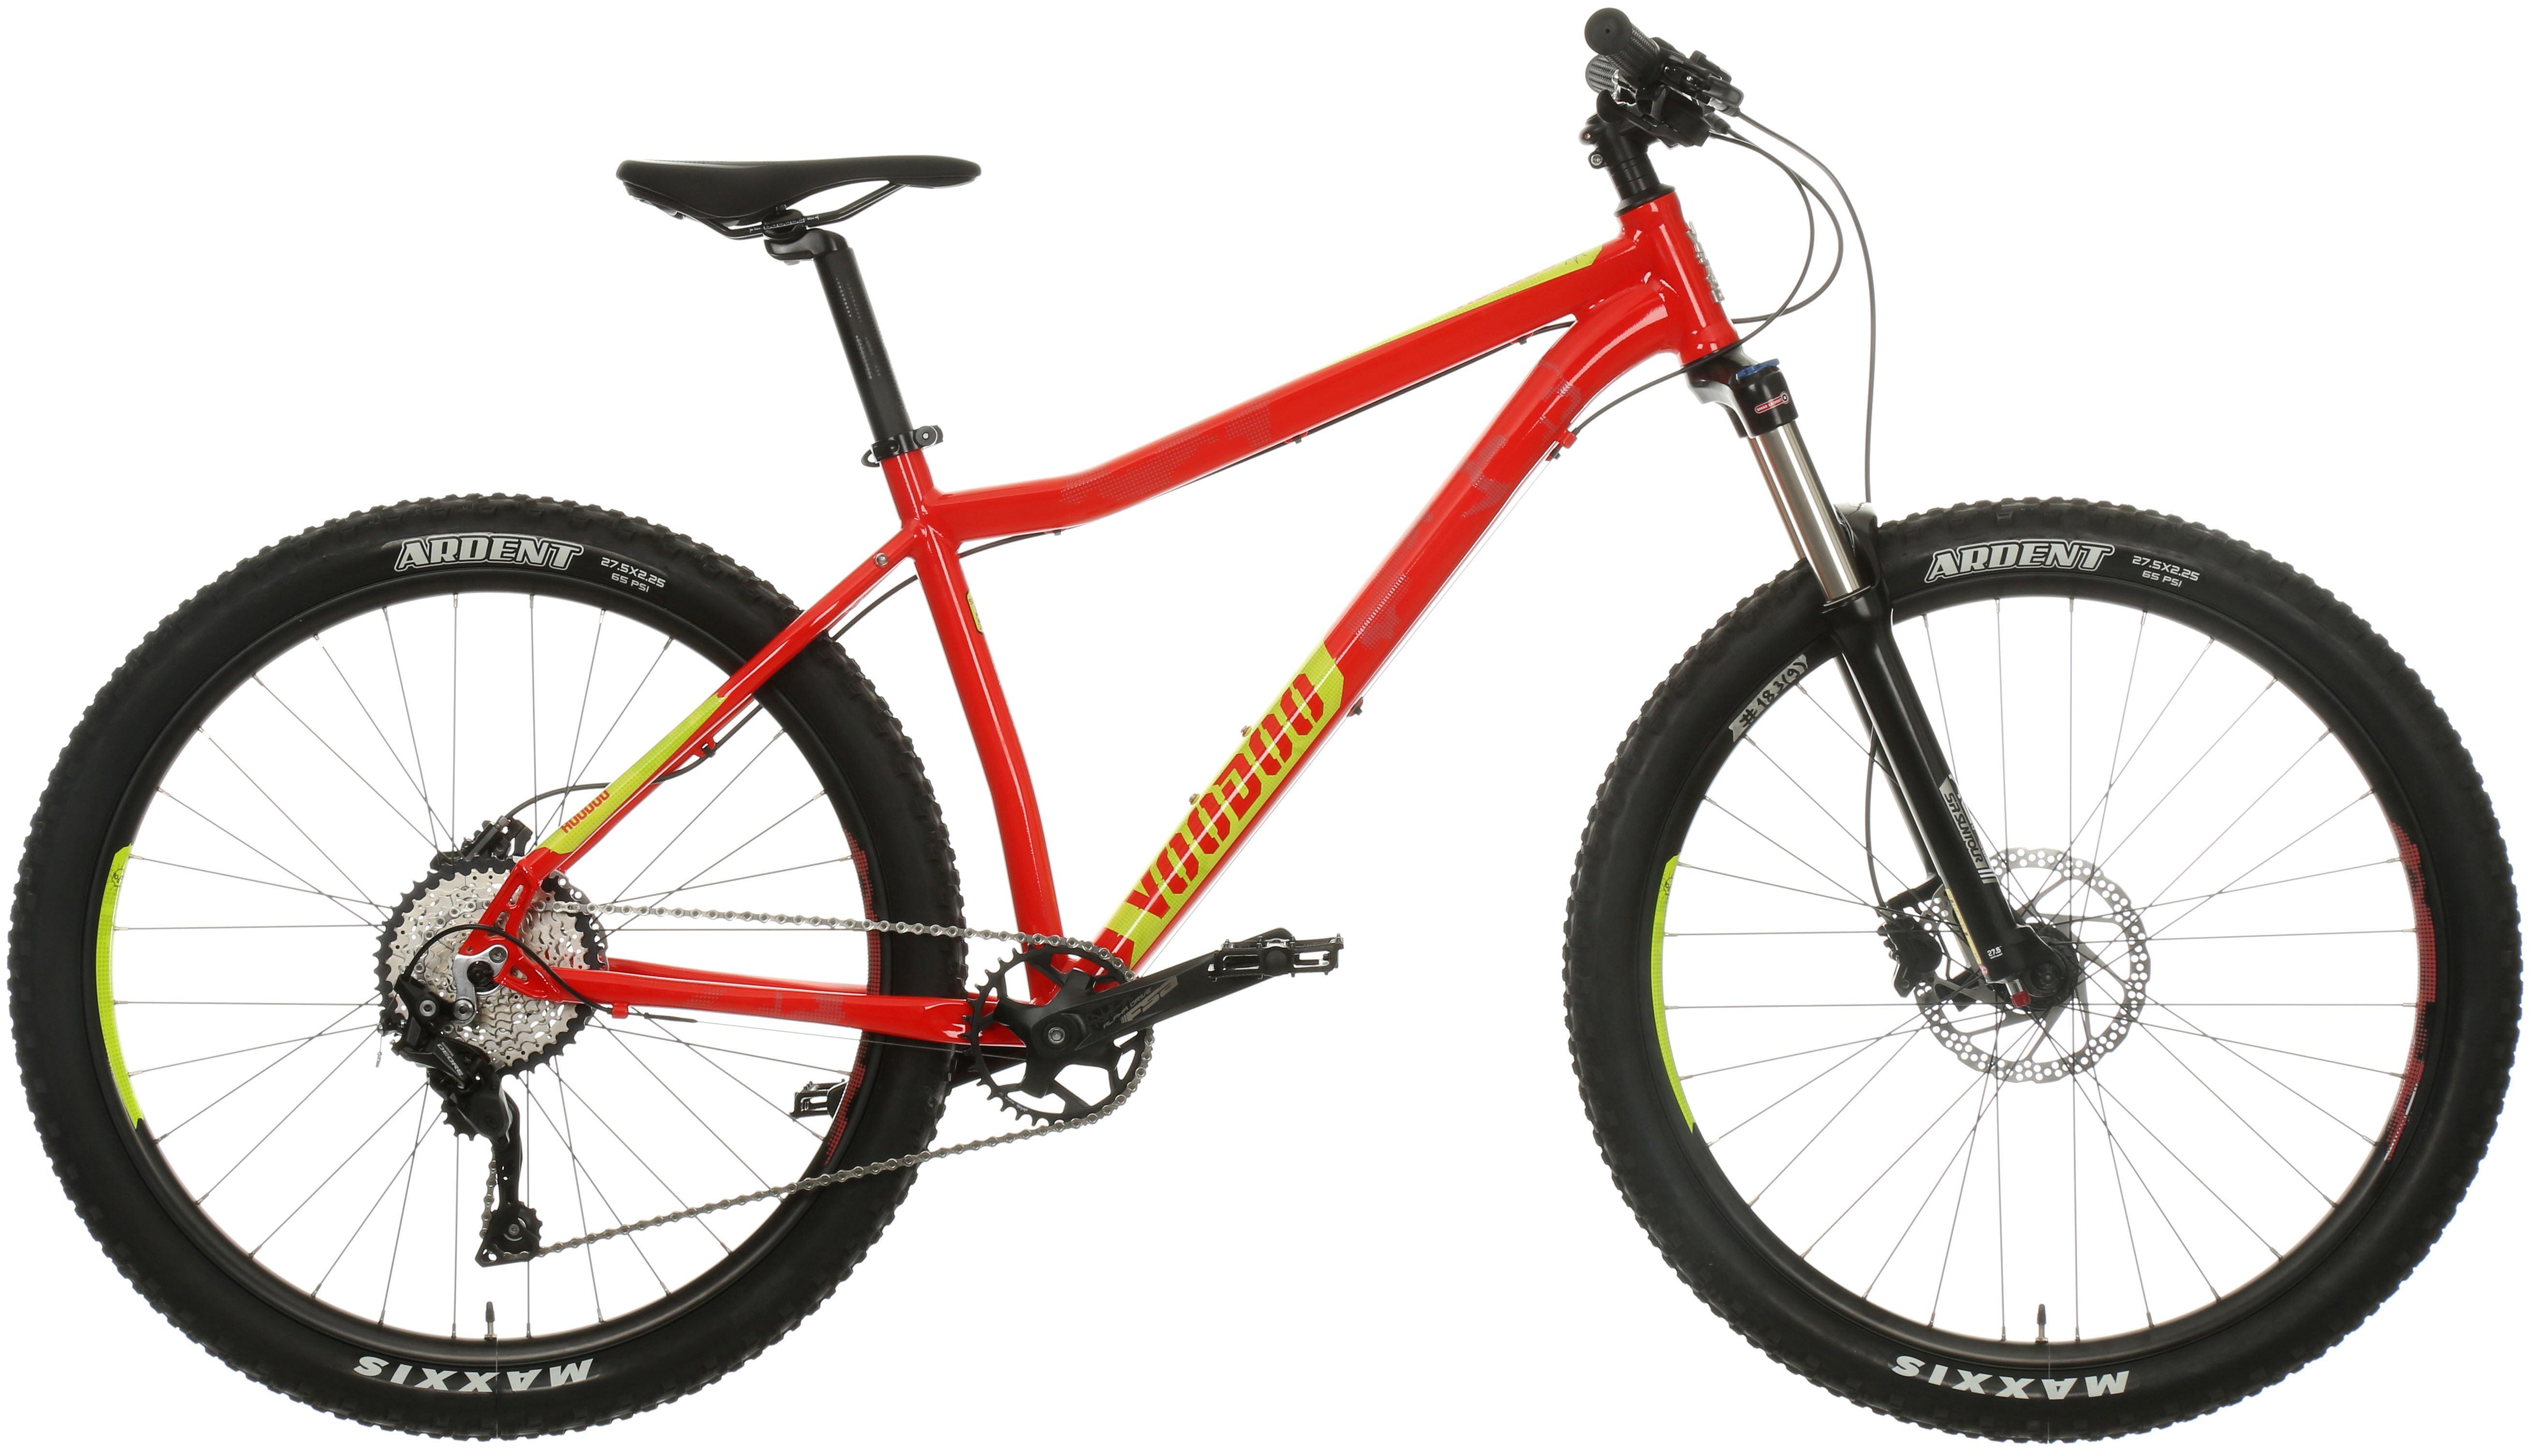 Voodoo Hoodoo Mountain Bike   16 Inch